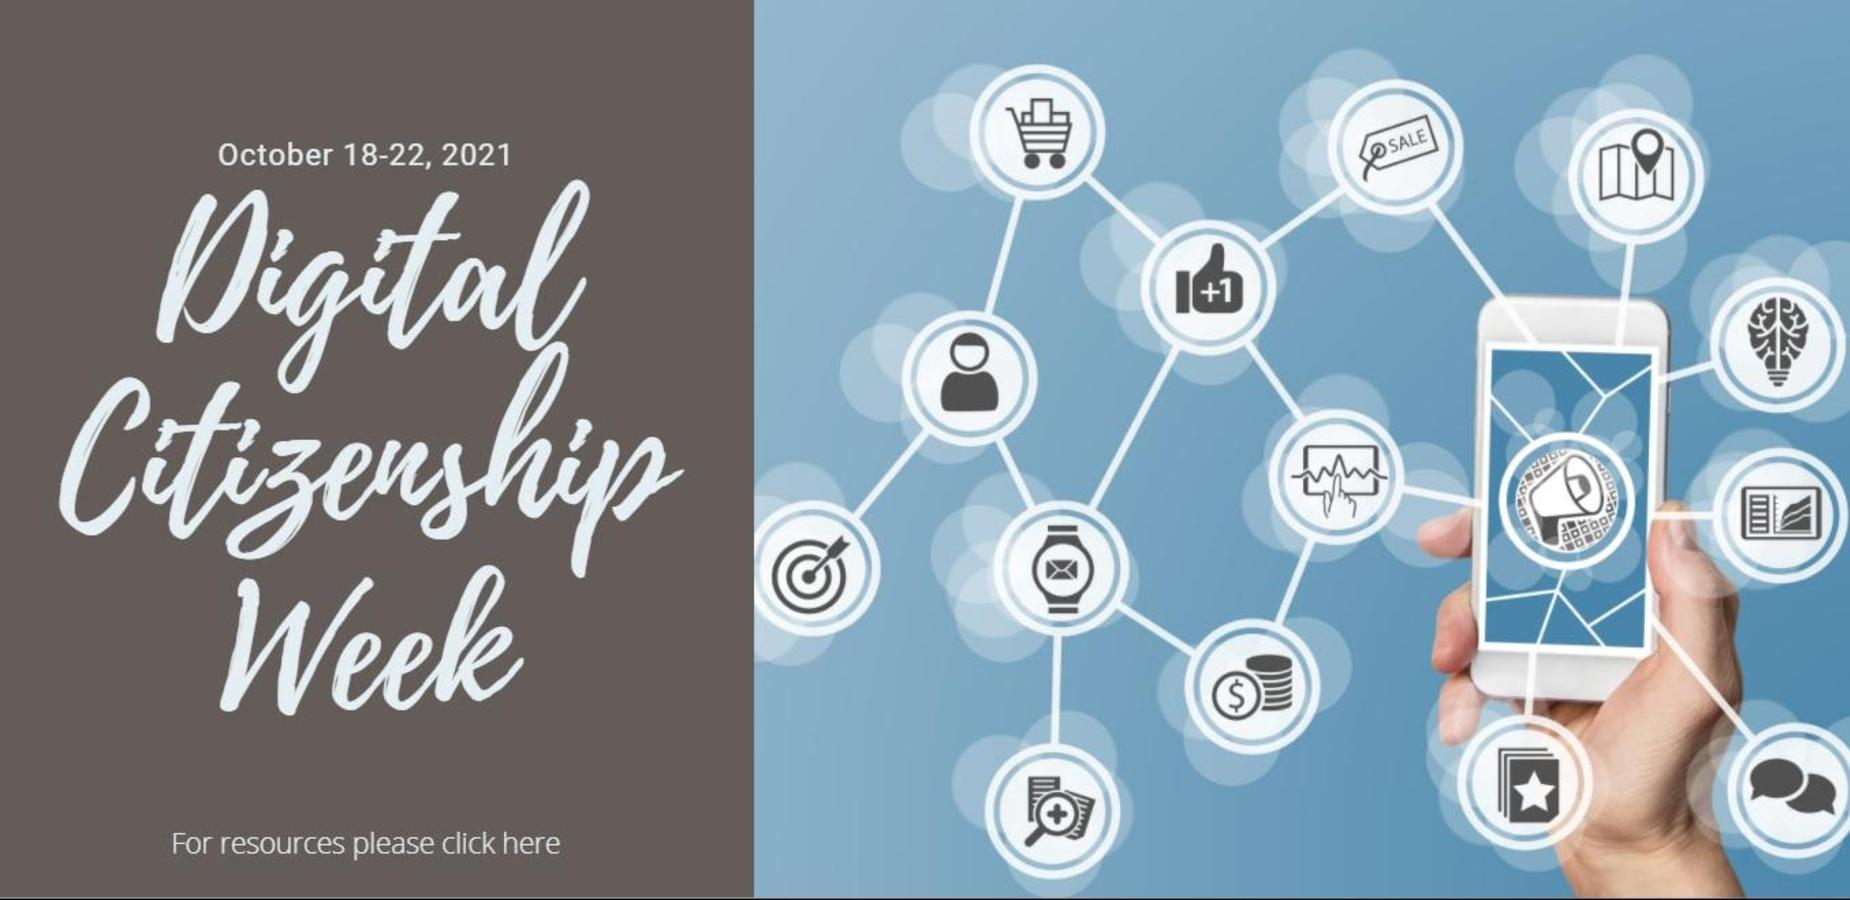 Digital Citizenship Week October 18-22